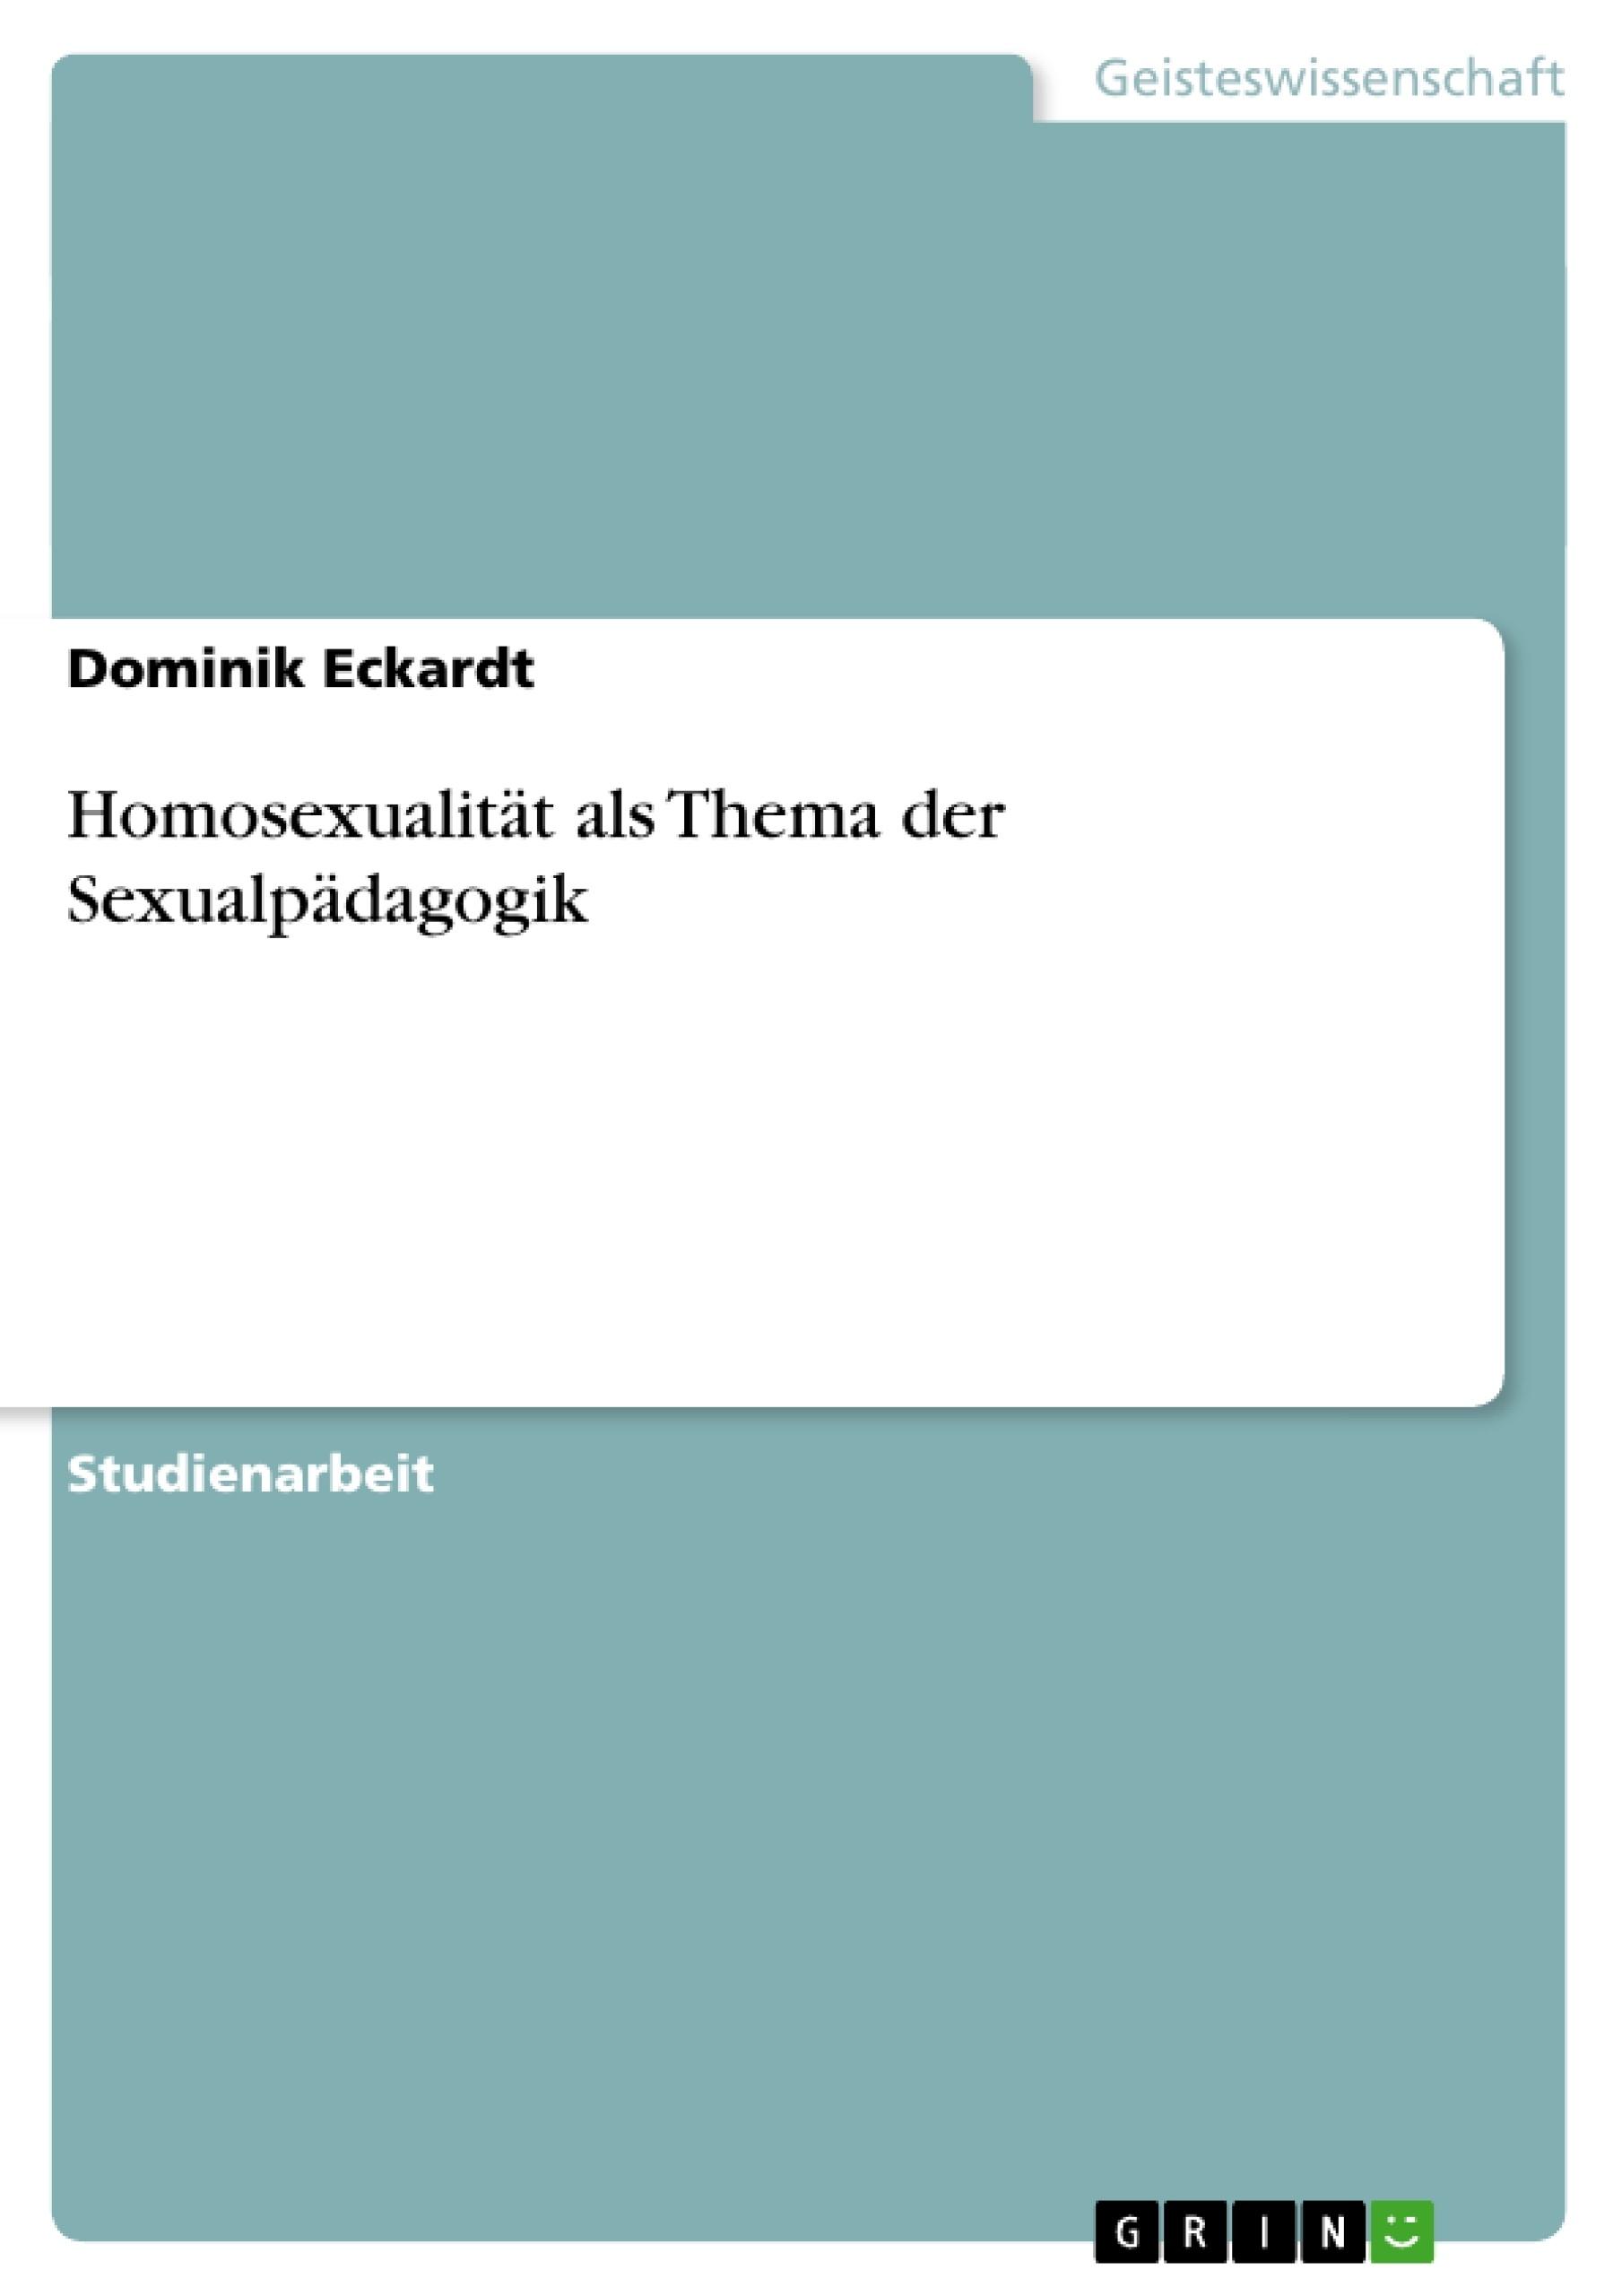 Titel: Homosexualität als Thema der Sexualpädagogik